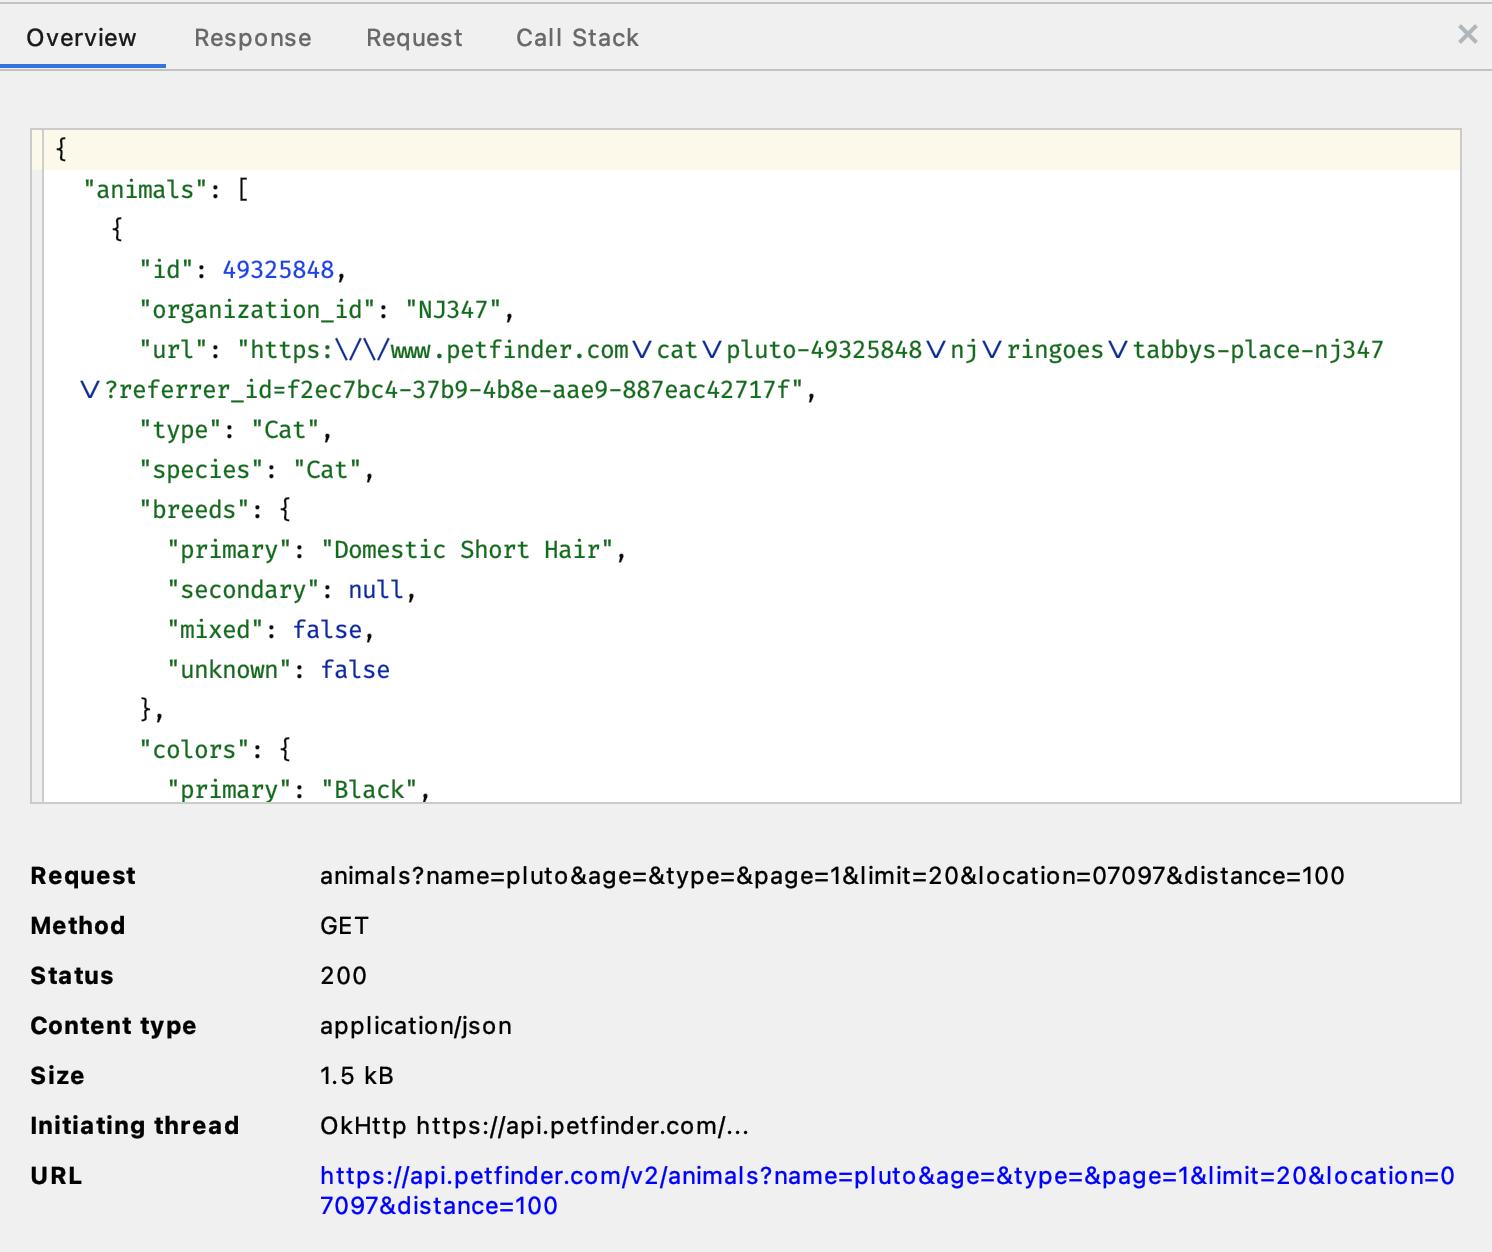 Figure 21.15 — Network Profiler Request Detail